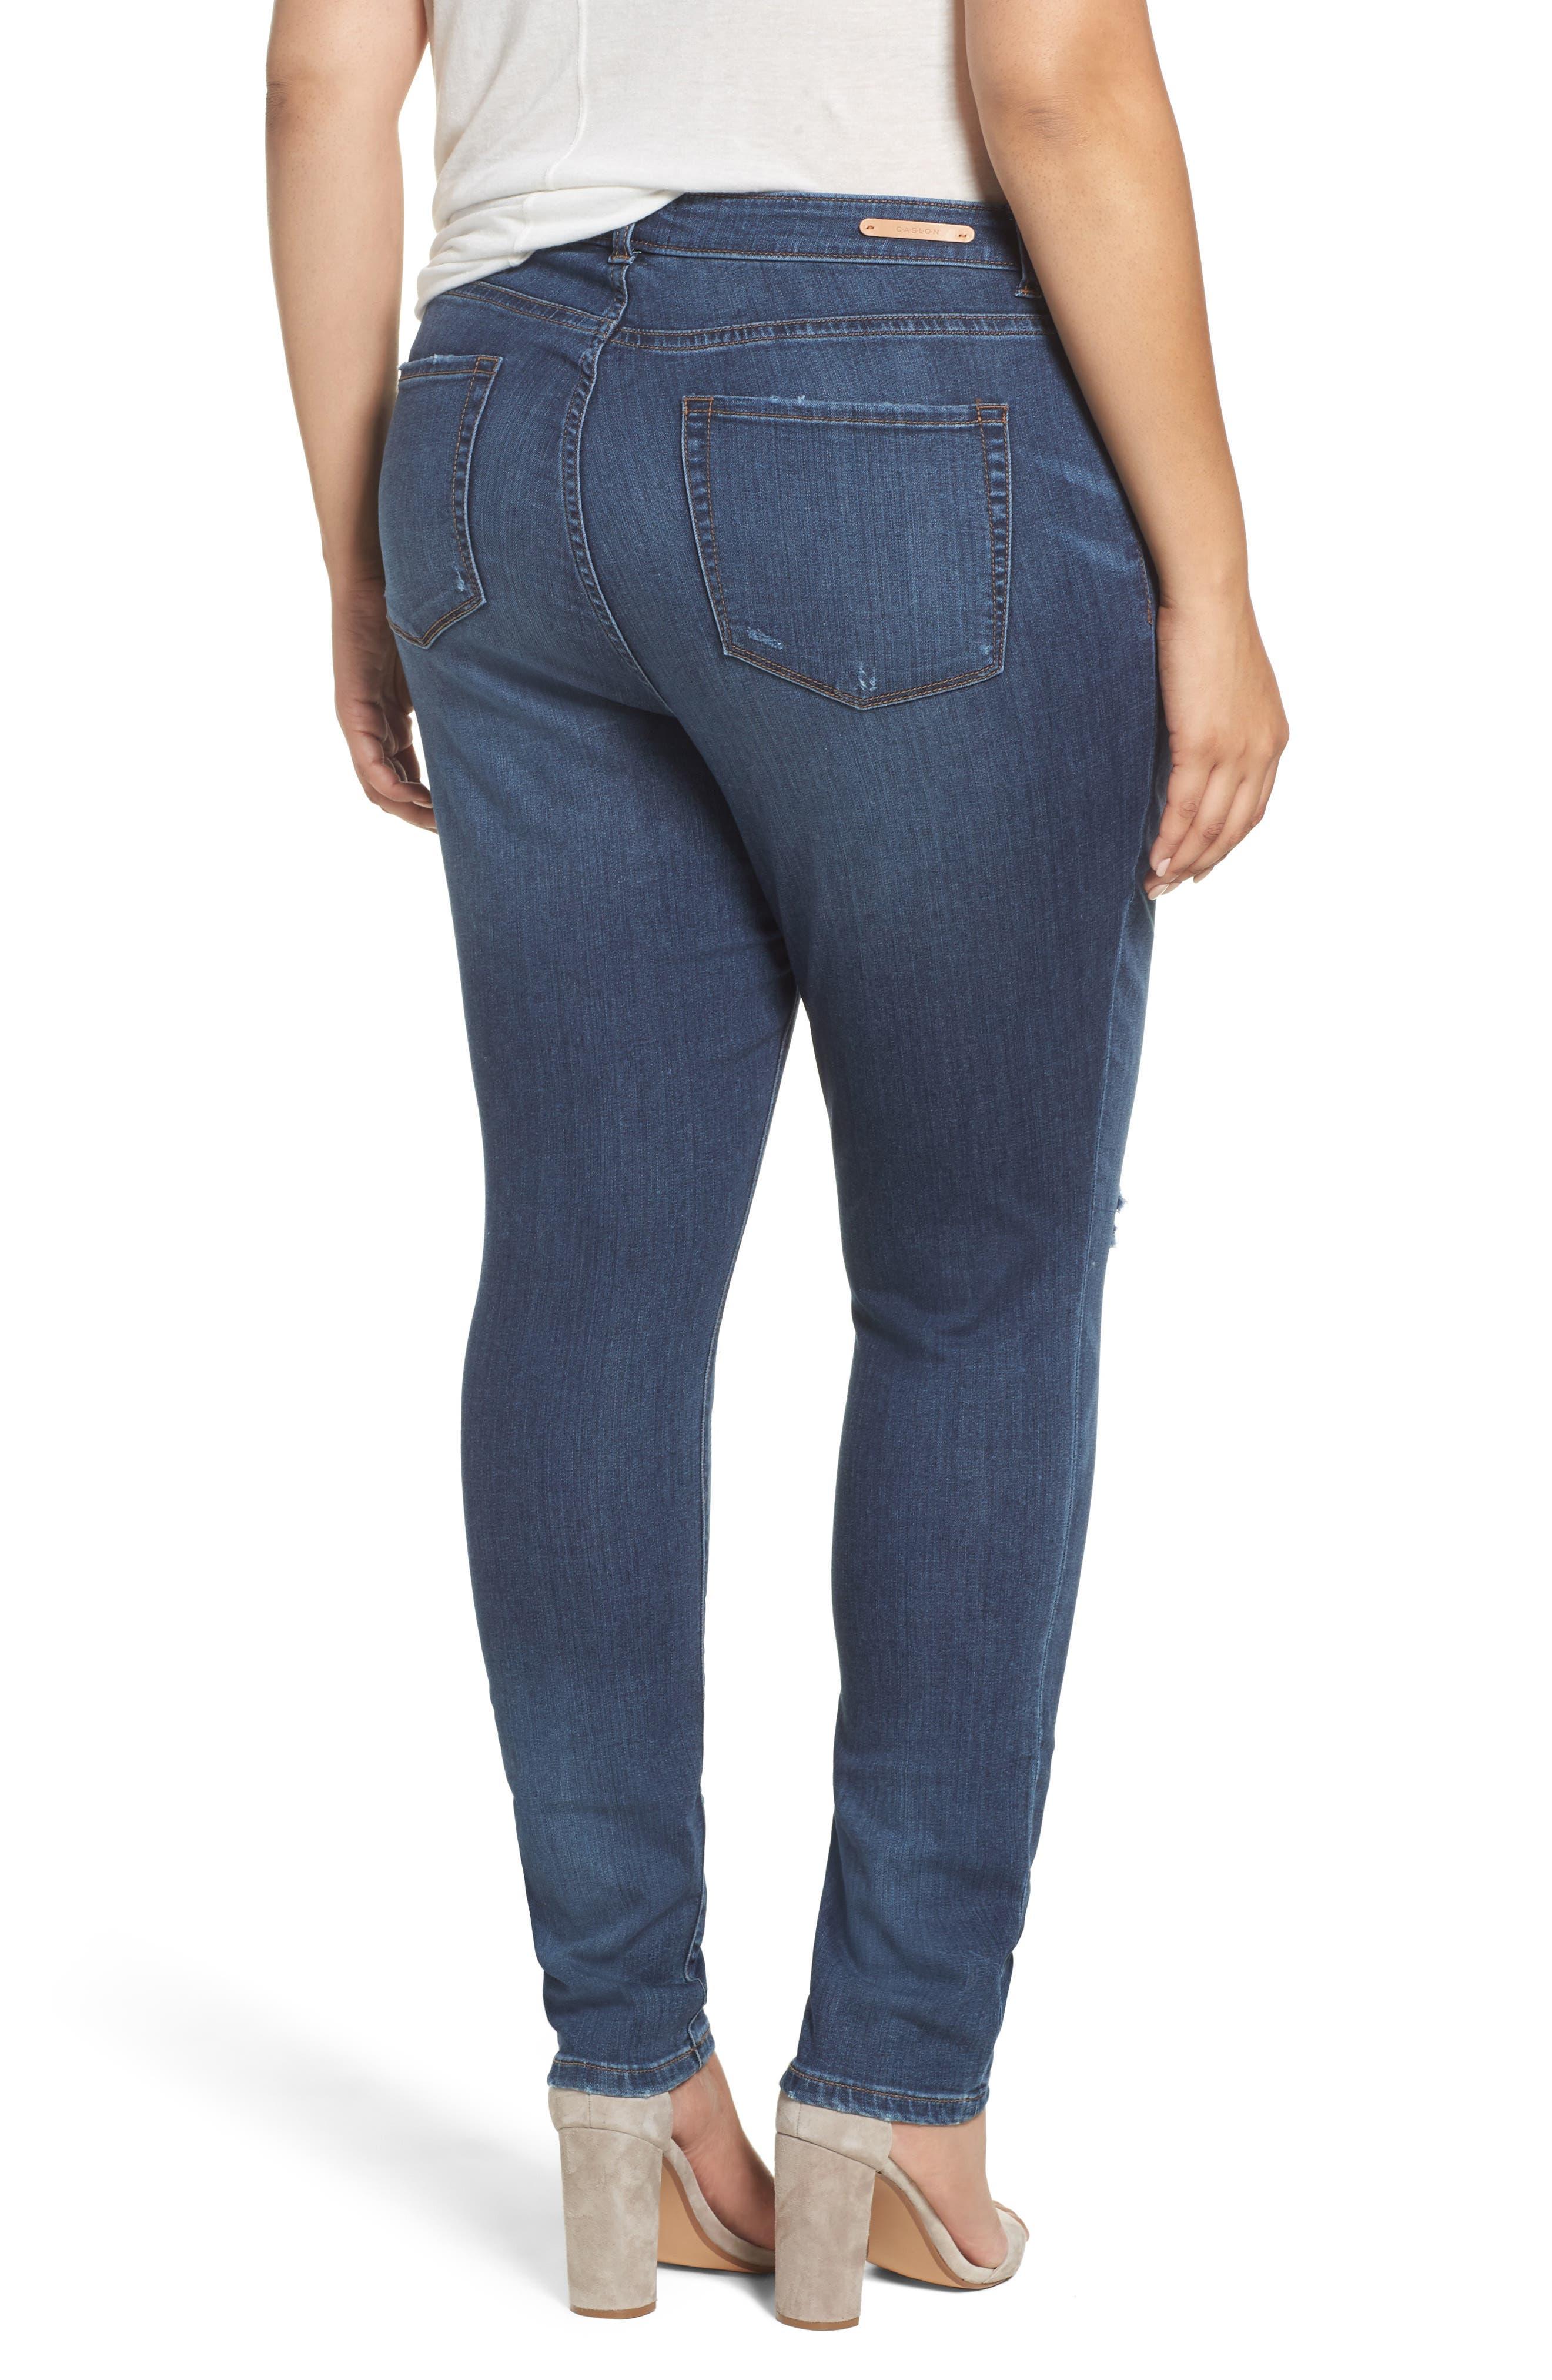 Rip Repair Skinny Jeans,                             Alternate thumbnail 3, color,                             Blue Octavia Wash